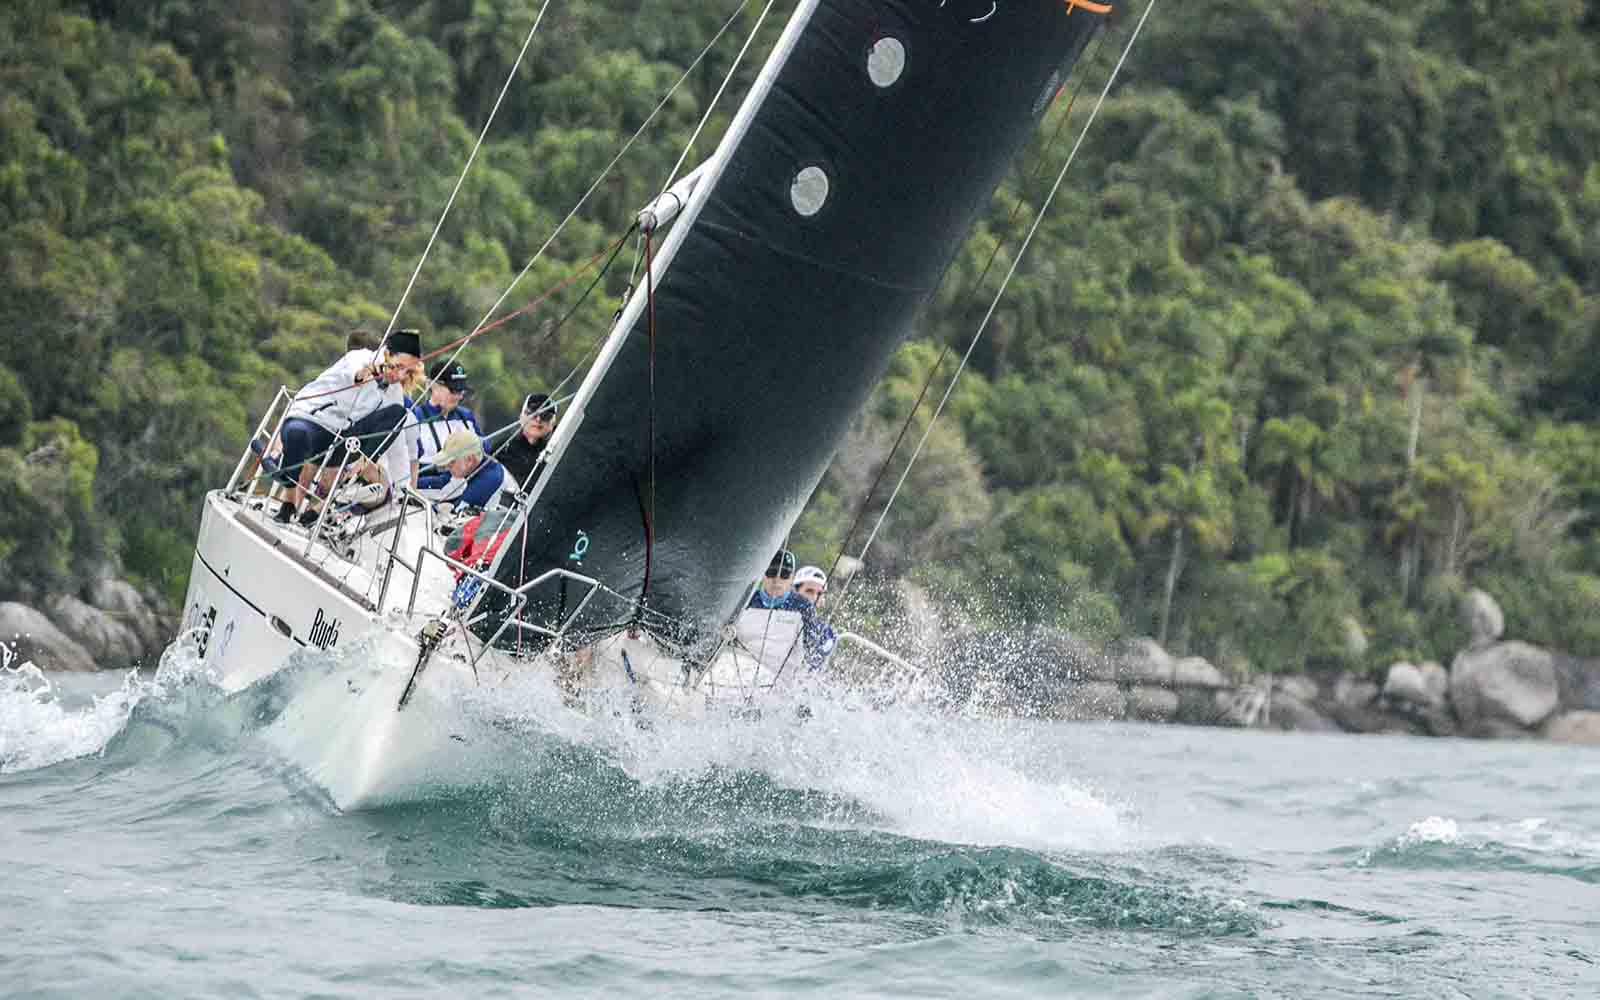 Copa Suzuki Rudá venceu as duas regatas na IRC (Aline Bassi Balaio de Ideias) - boat shopping